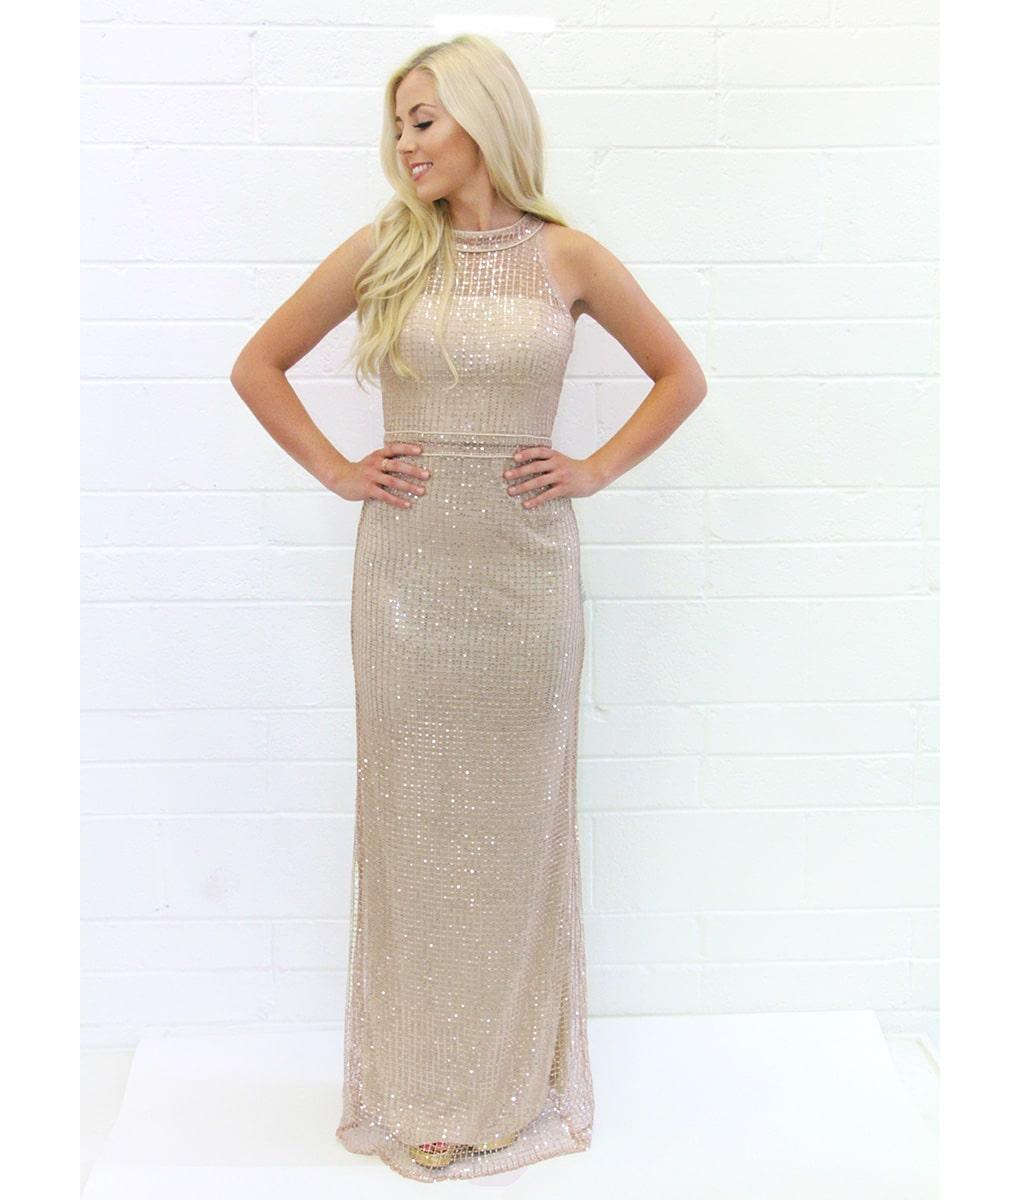 Bariano - Champagne Sequins Cape Gown | Alila Boutique